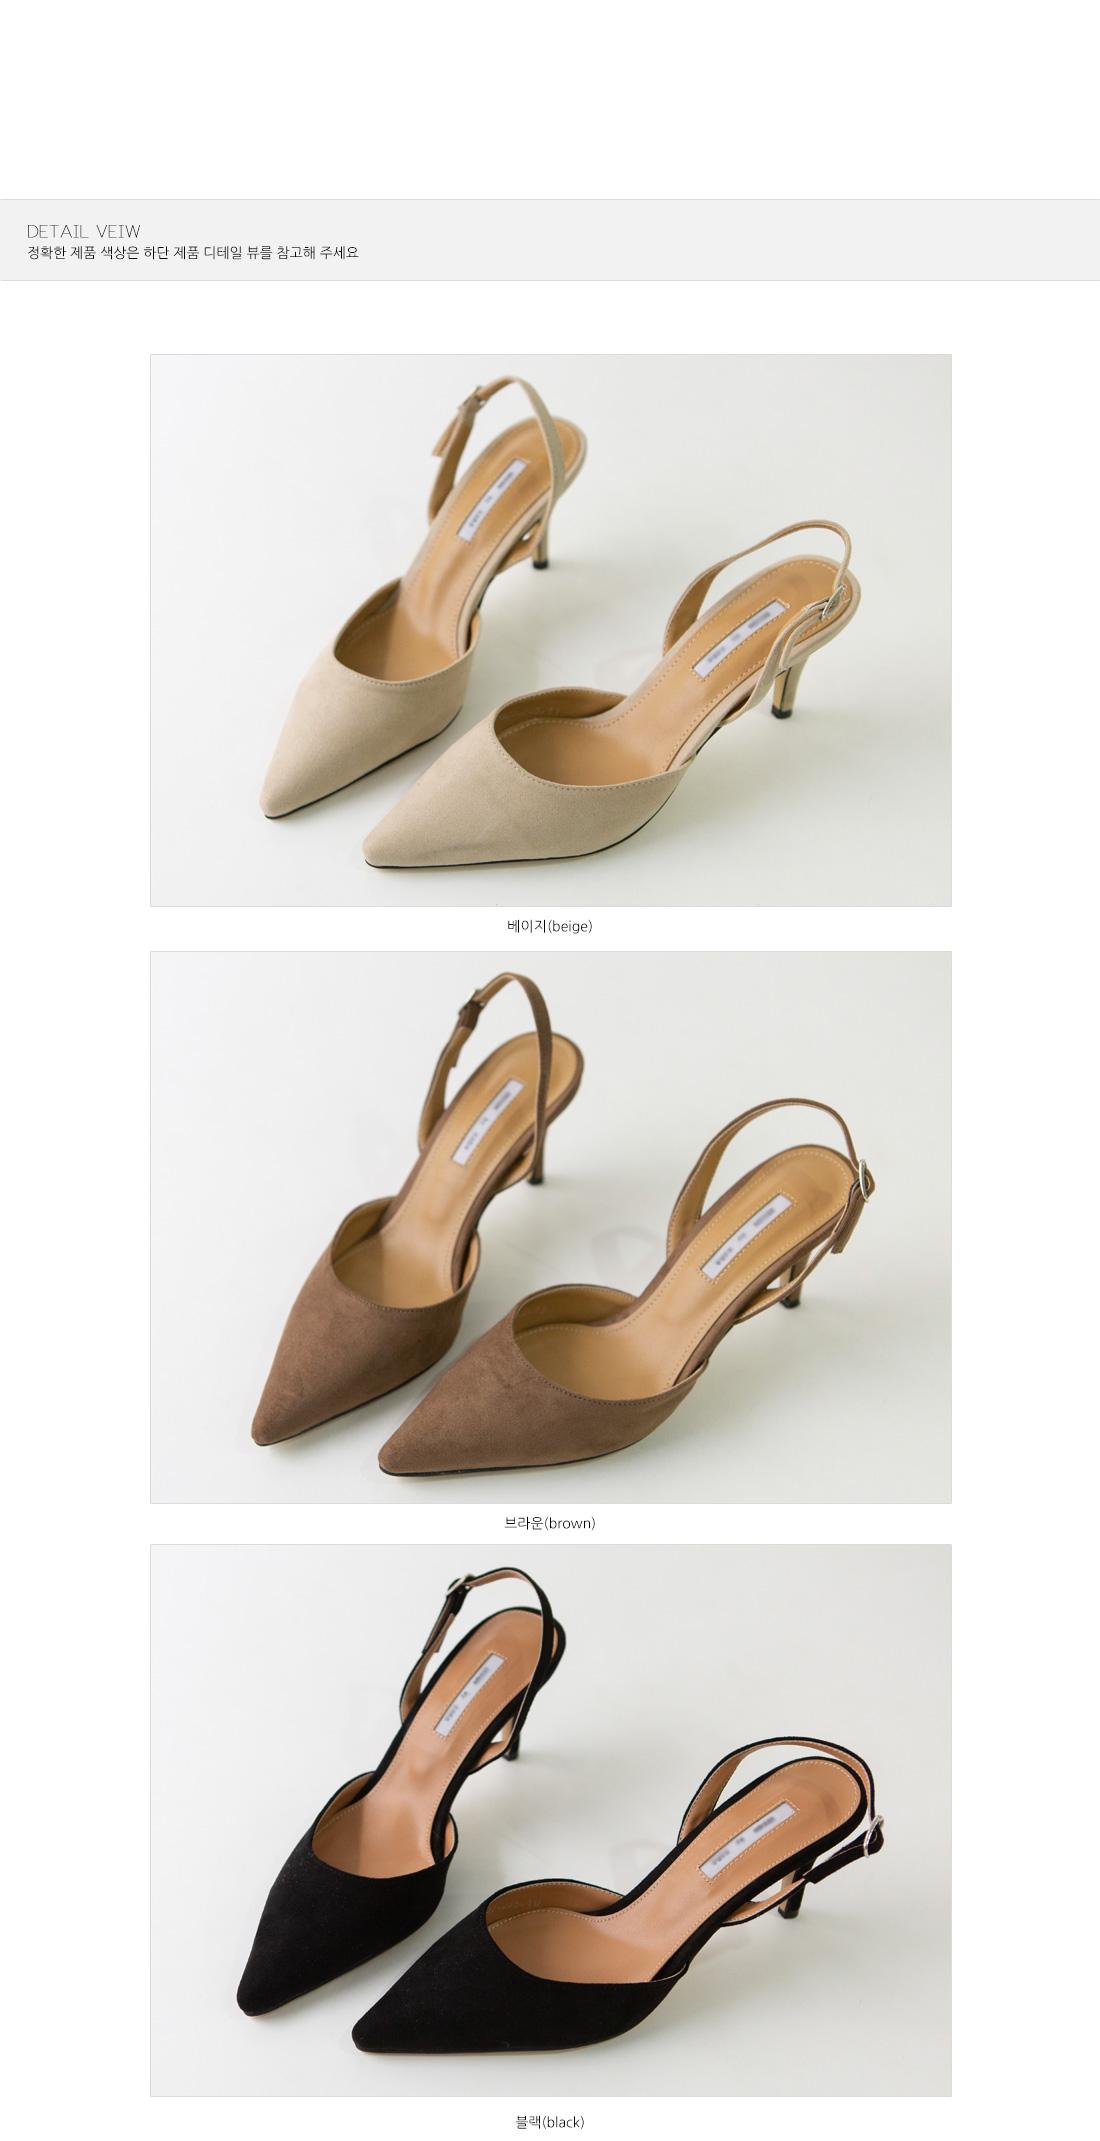 Stiletto slingback shoes #85509